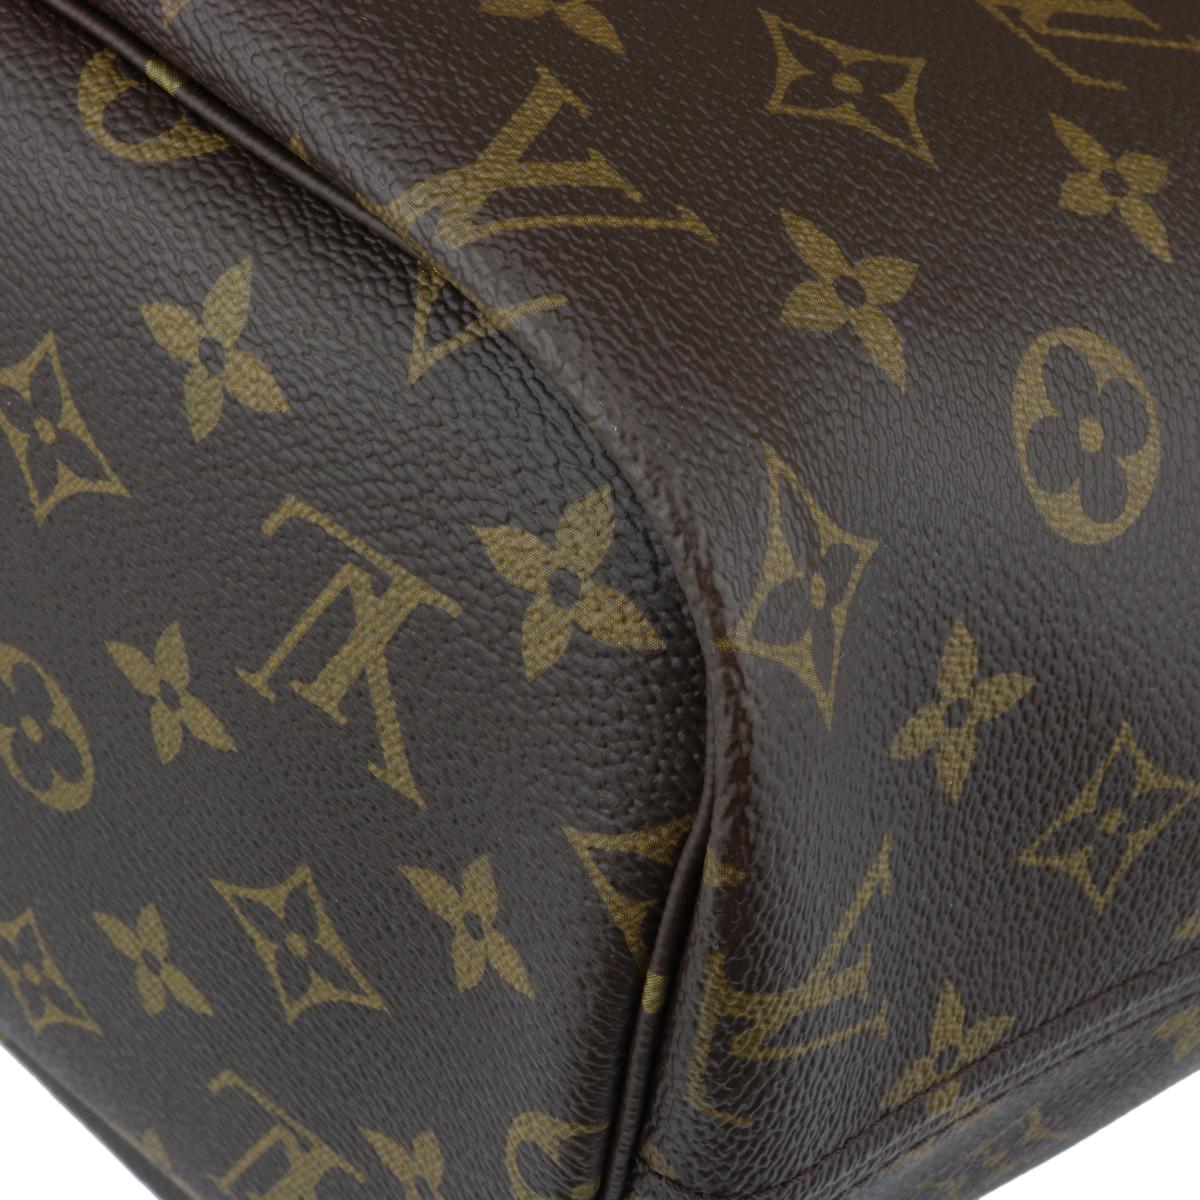 Louis Vuitton World Tour Neverfull Mm Monogram Gold Hardware 2019 Boutiqi Bags